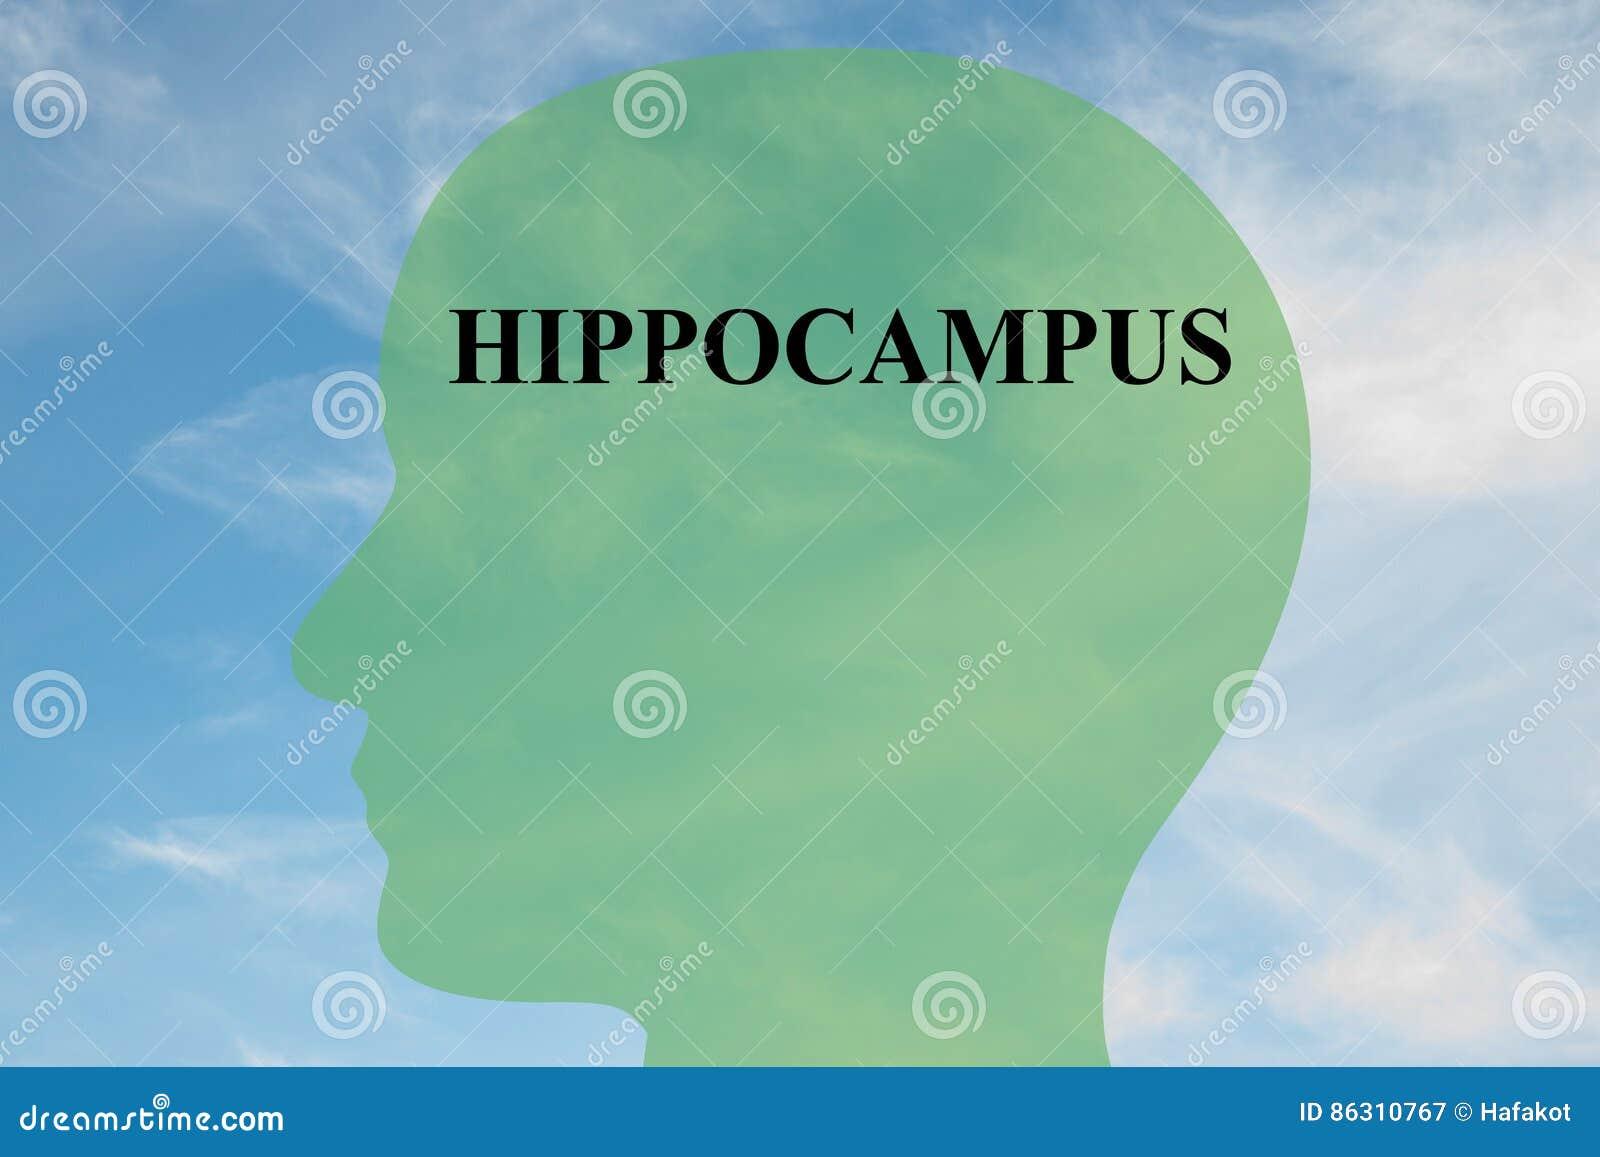 Hippocampus - Brain Anatomy Concept Stock Illustration ...